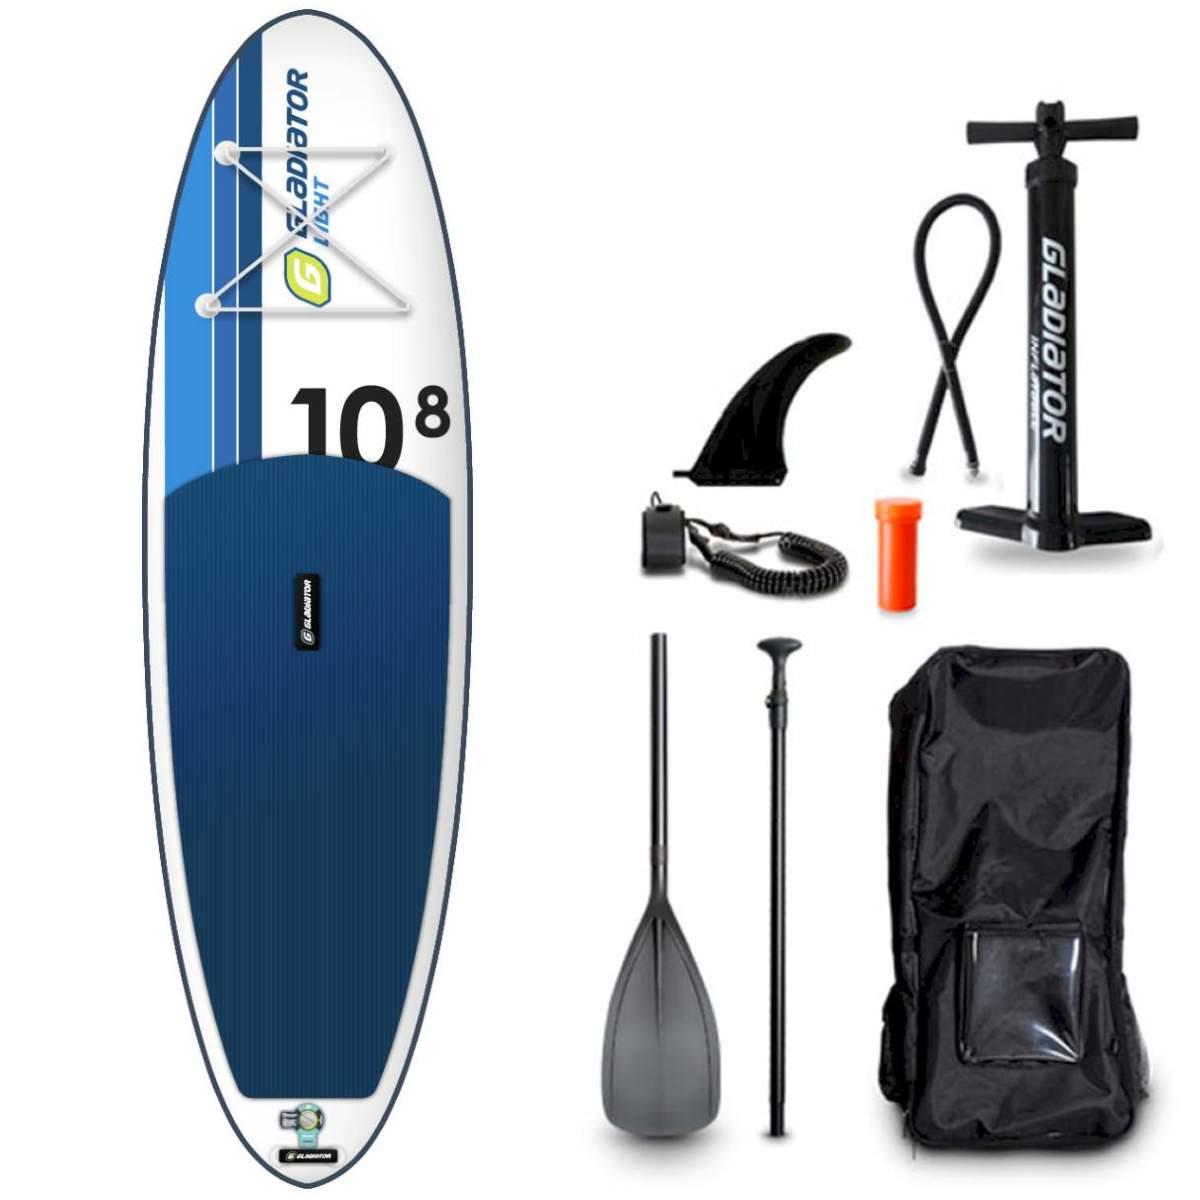 "[ 3s-Sup.de ] Gladiator LT 10'8"" x 34"" SUP Board Set 2021 + hochwertigen Waterproof Bag"